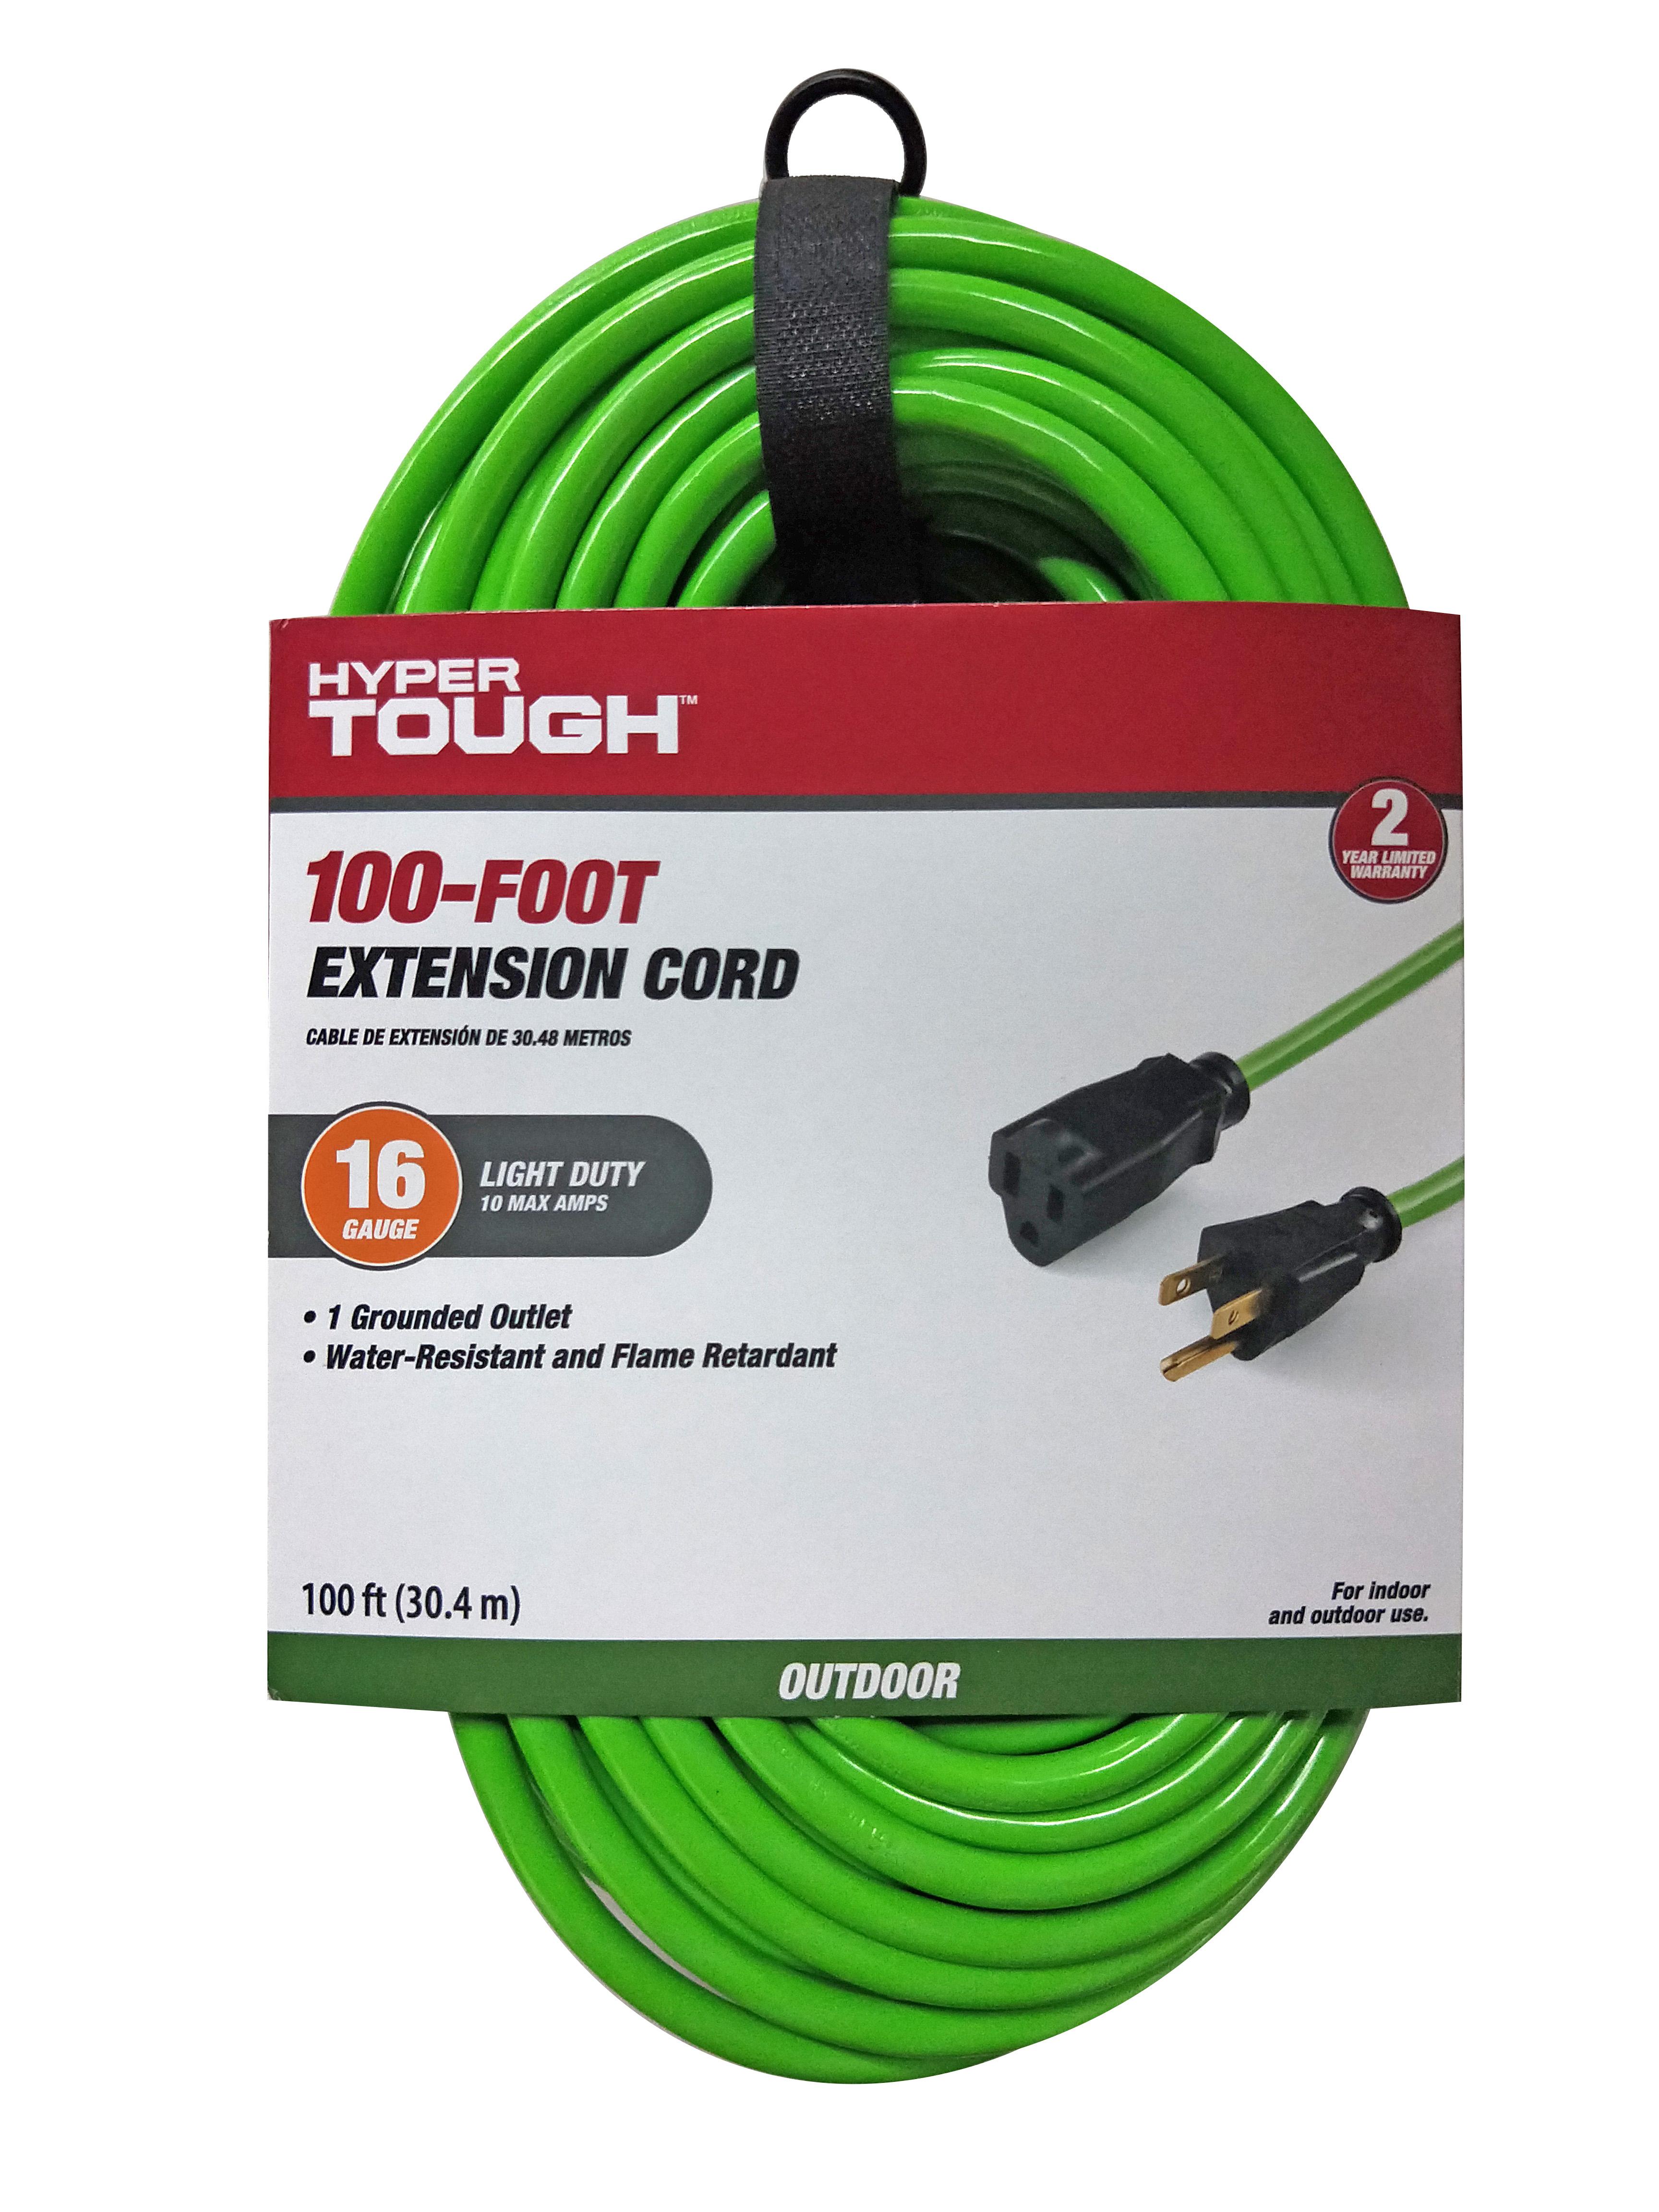 Hyper Tough 100FT 16/3 Extension Cord Orange For Outdoor use - Walmart.com